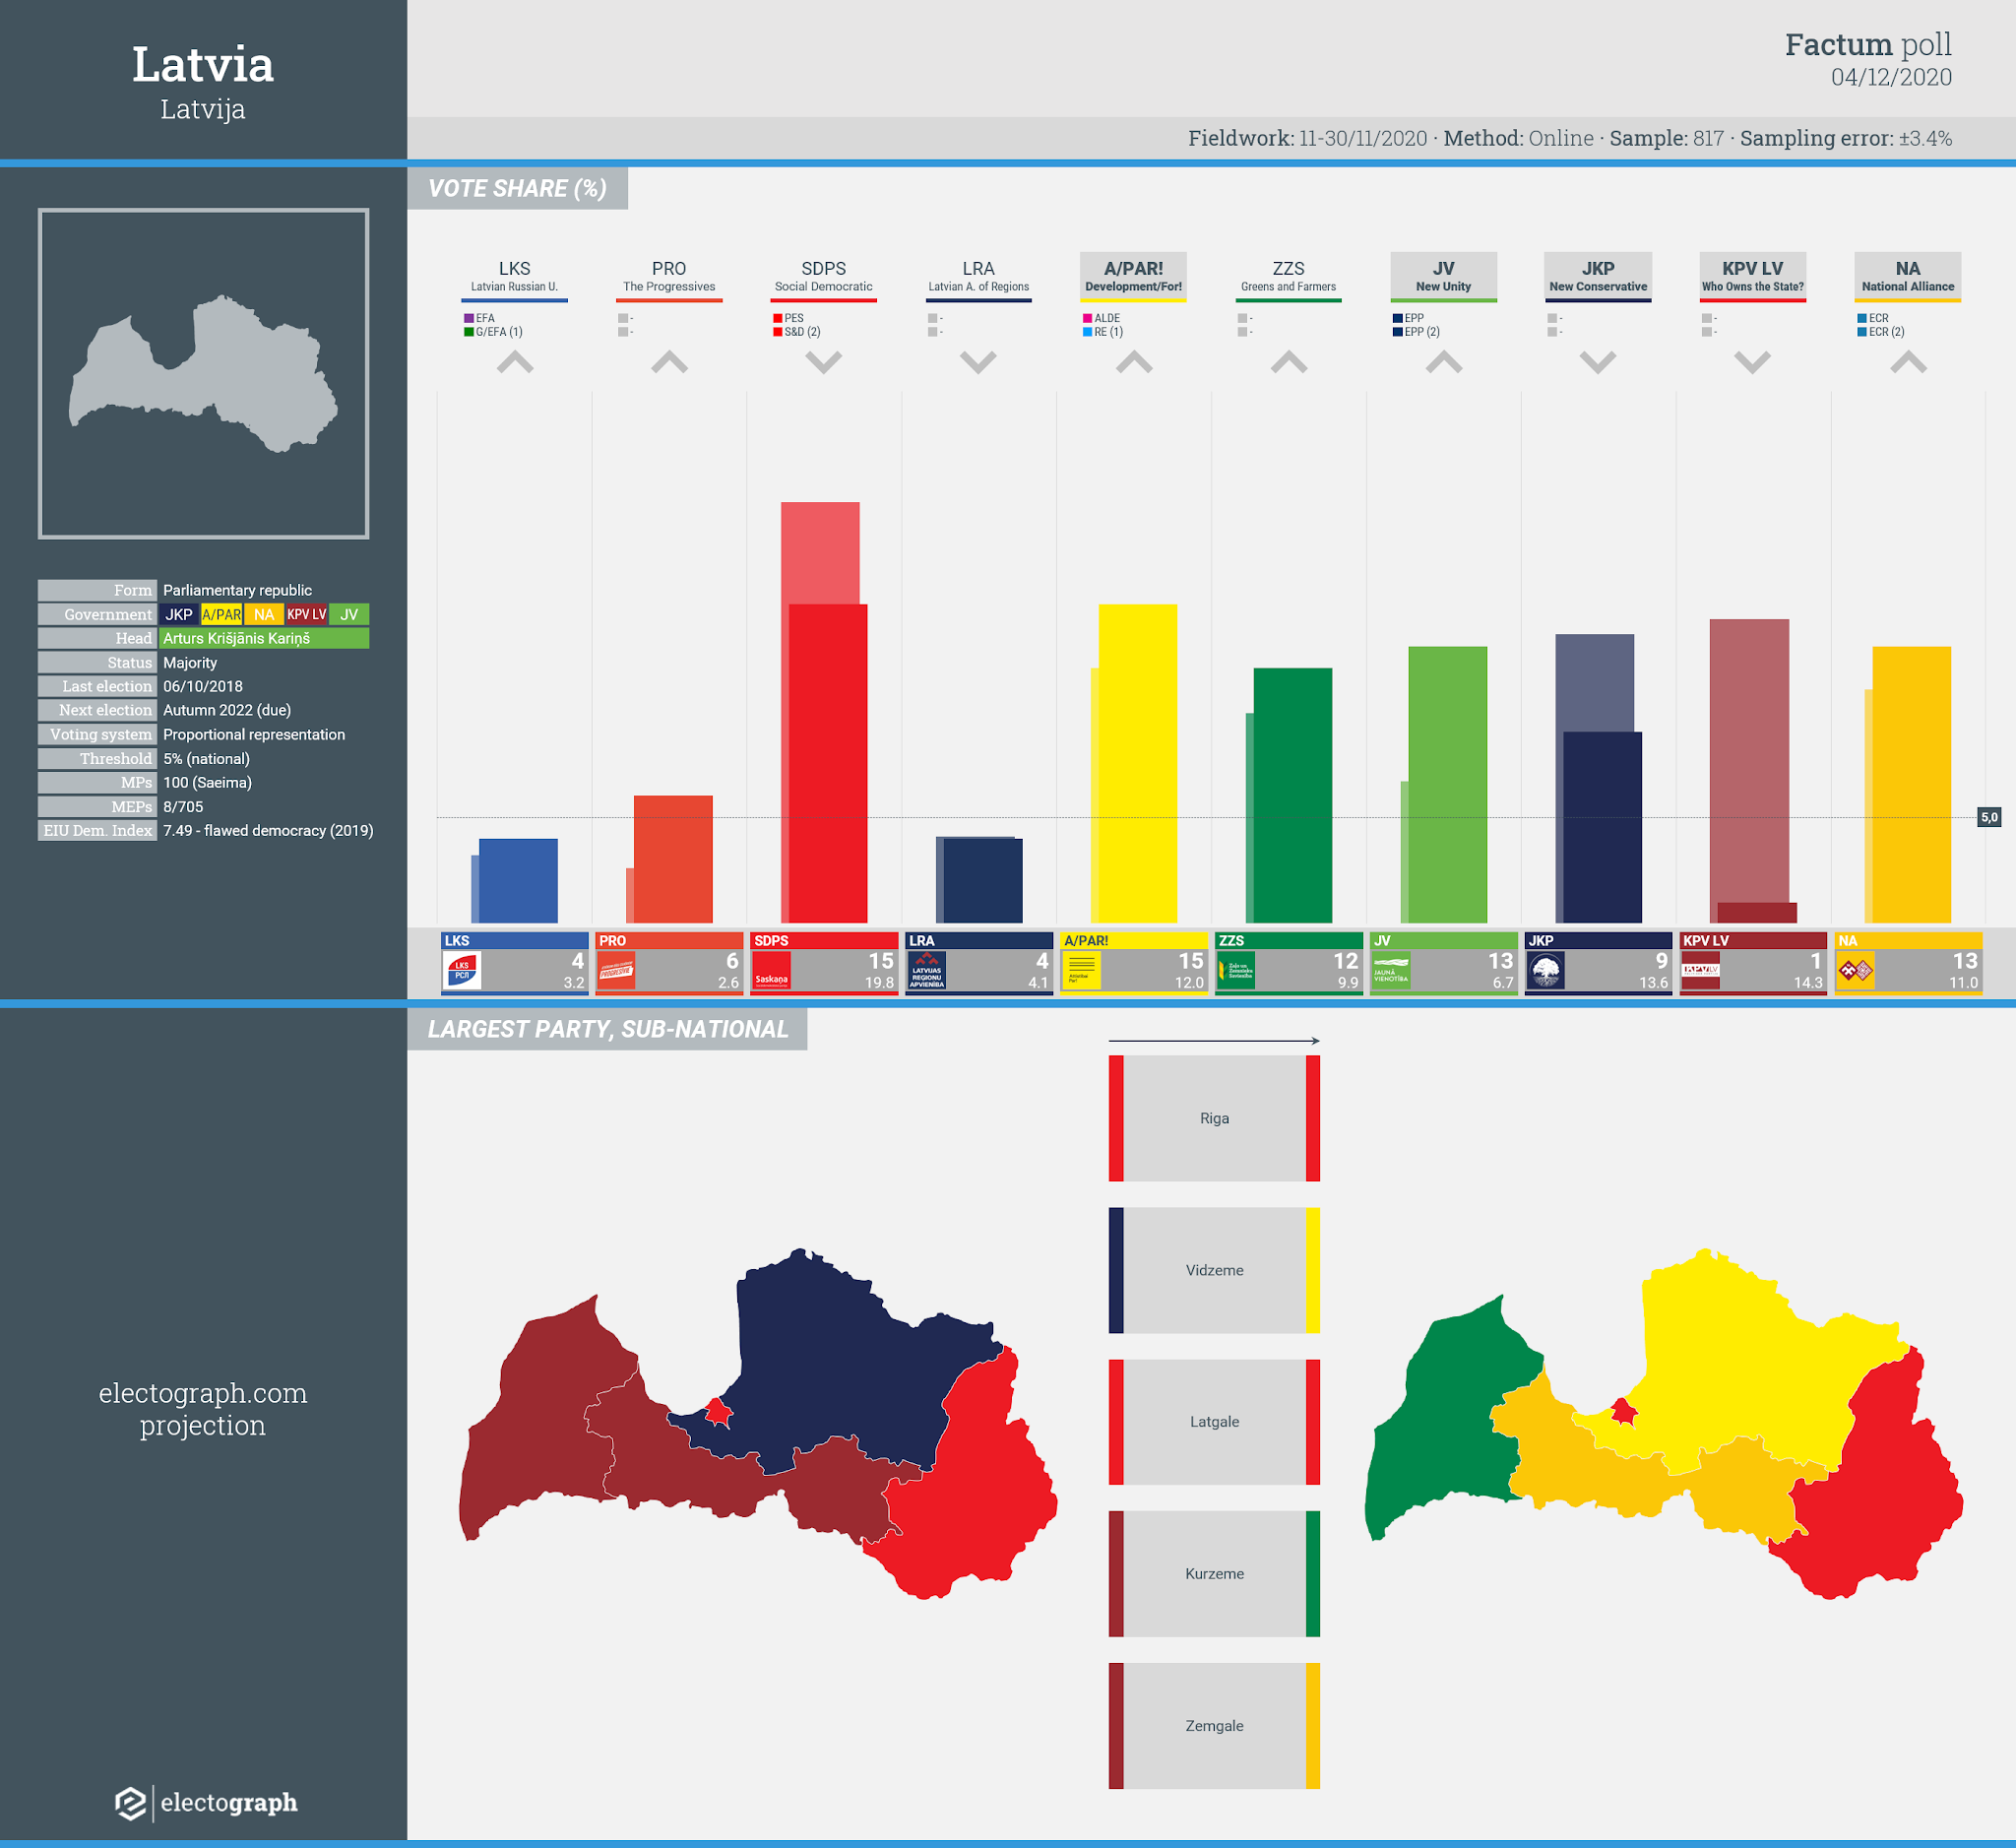 LATVIA: Factum poll chart, 4 December 2020